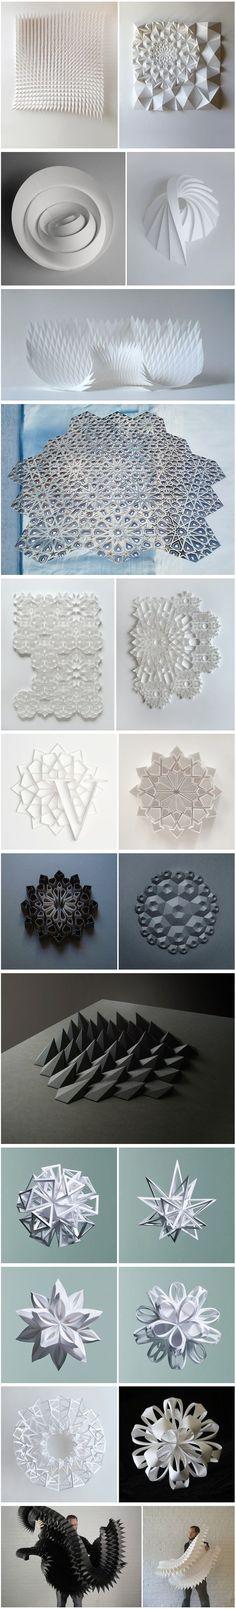 geometr paper, paper sculptures